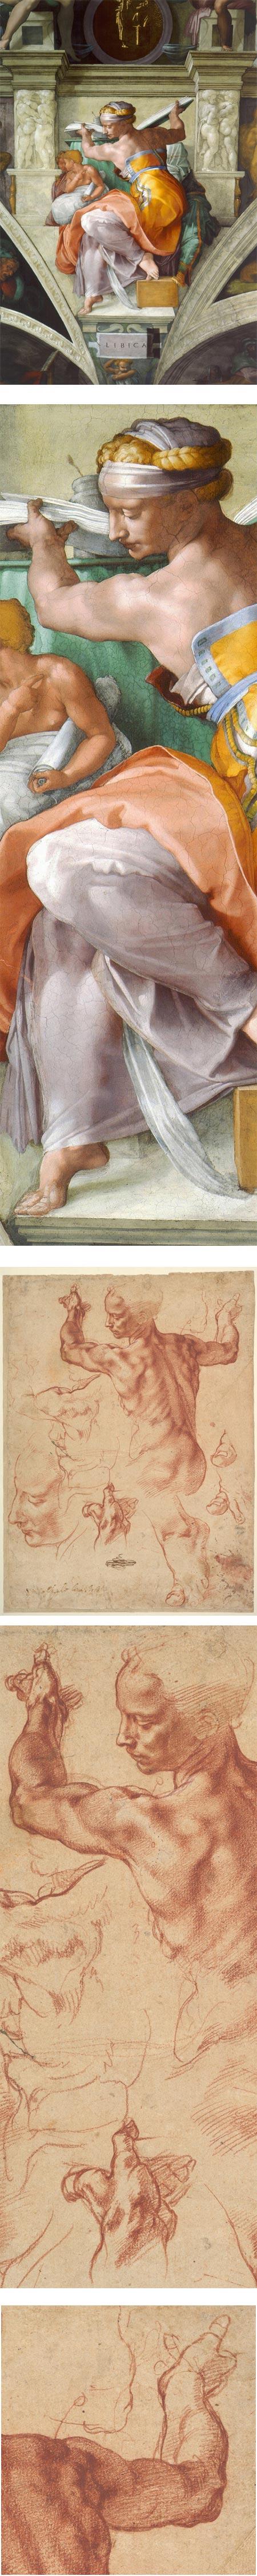 Michelangelo's Libyan Sibyl